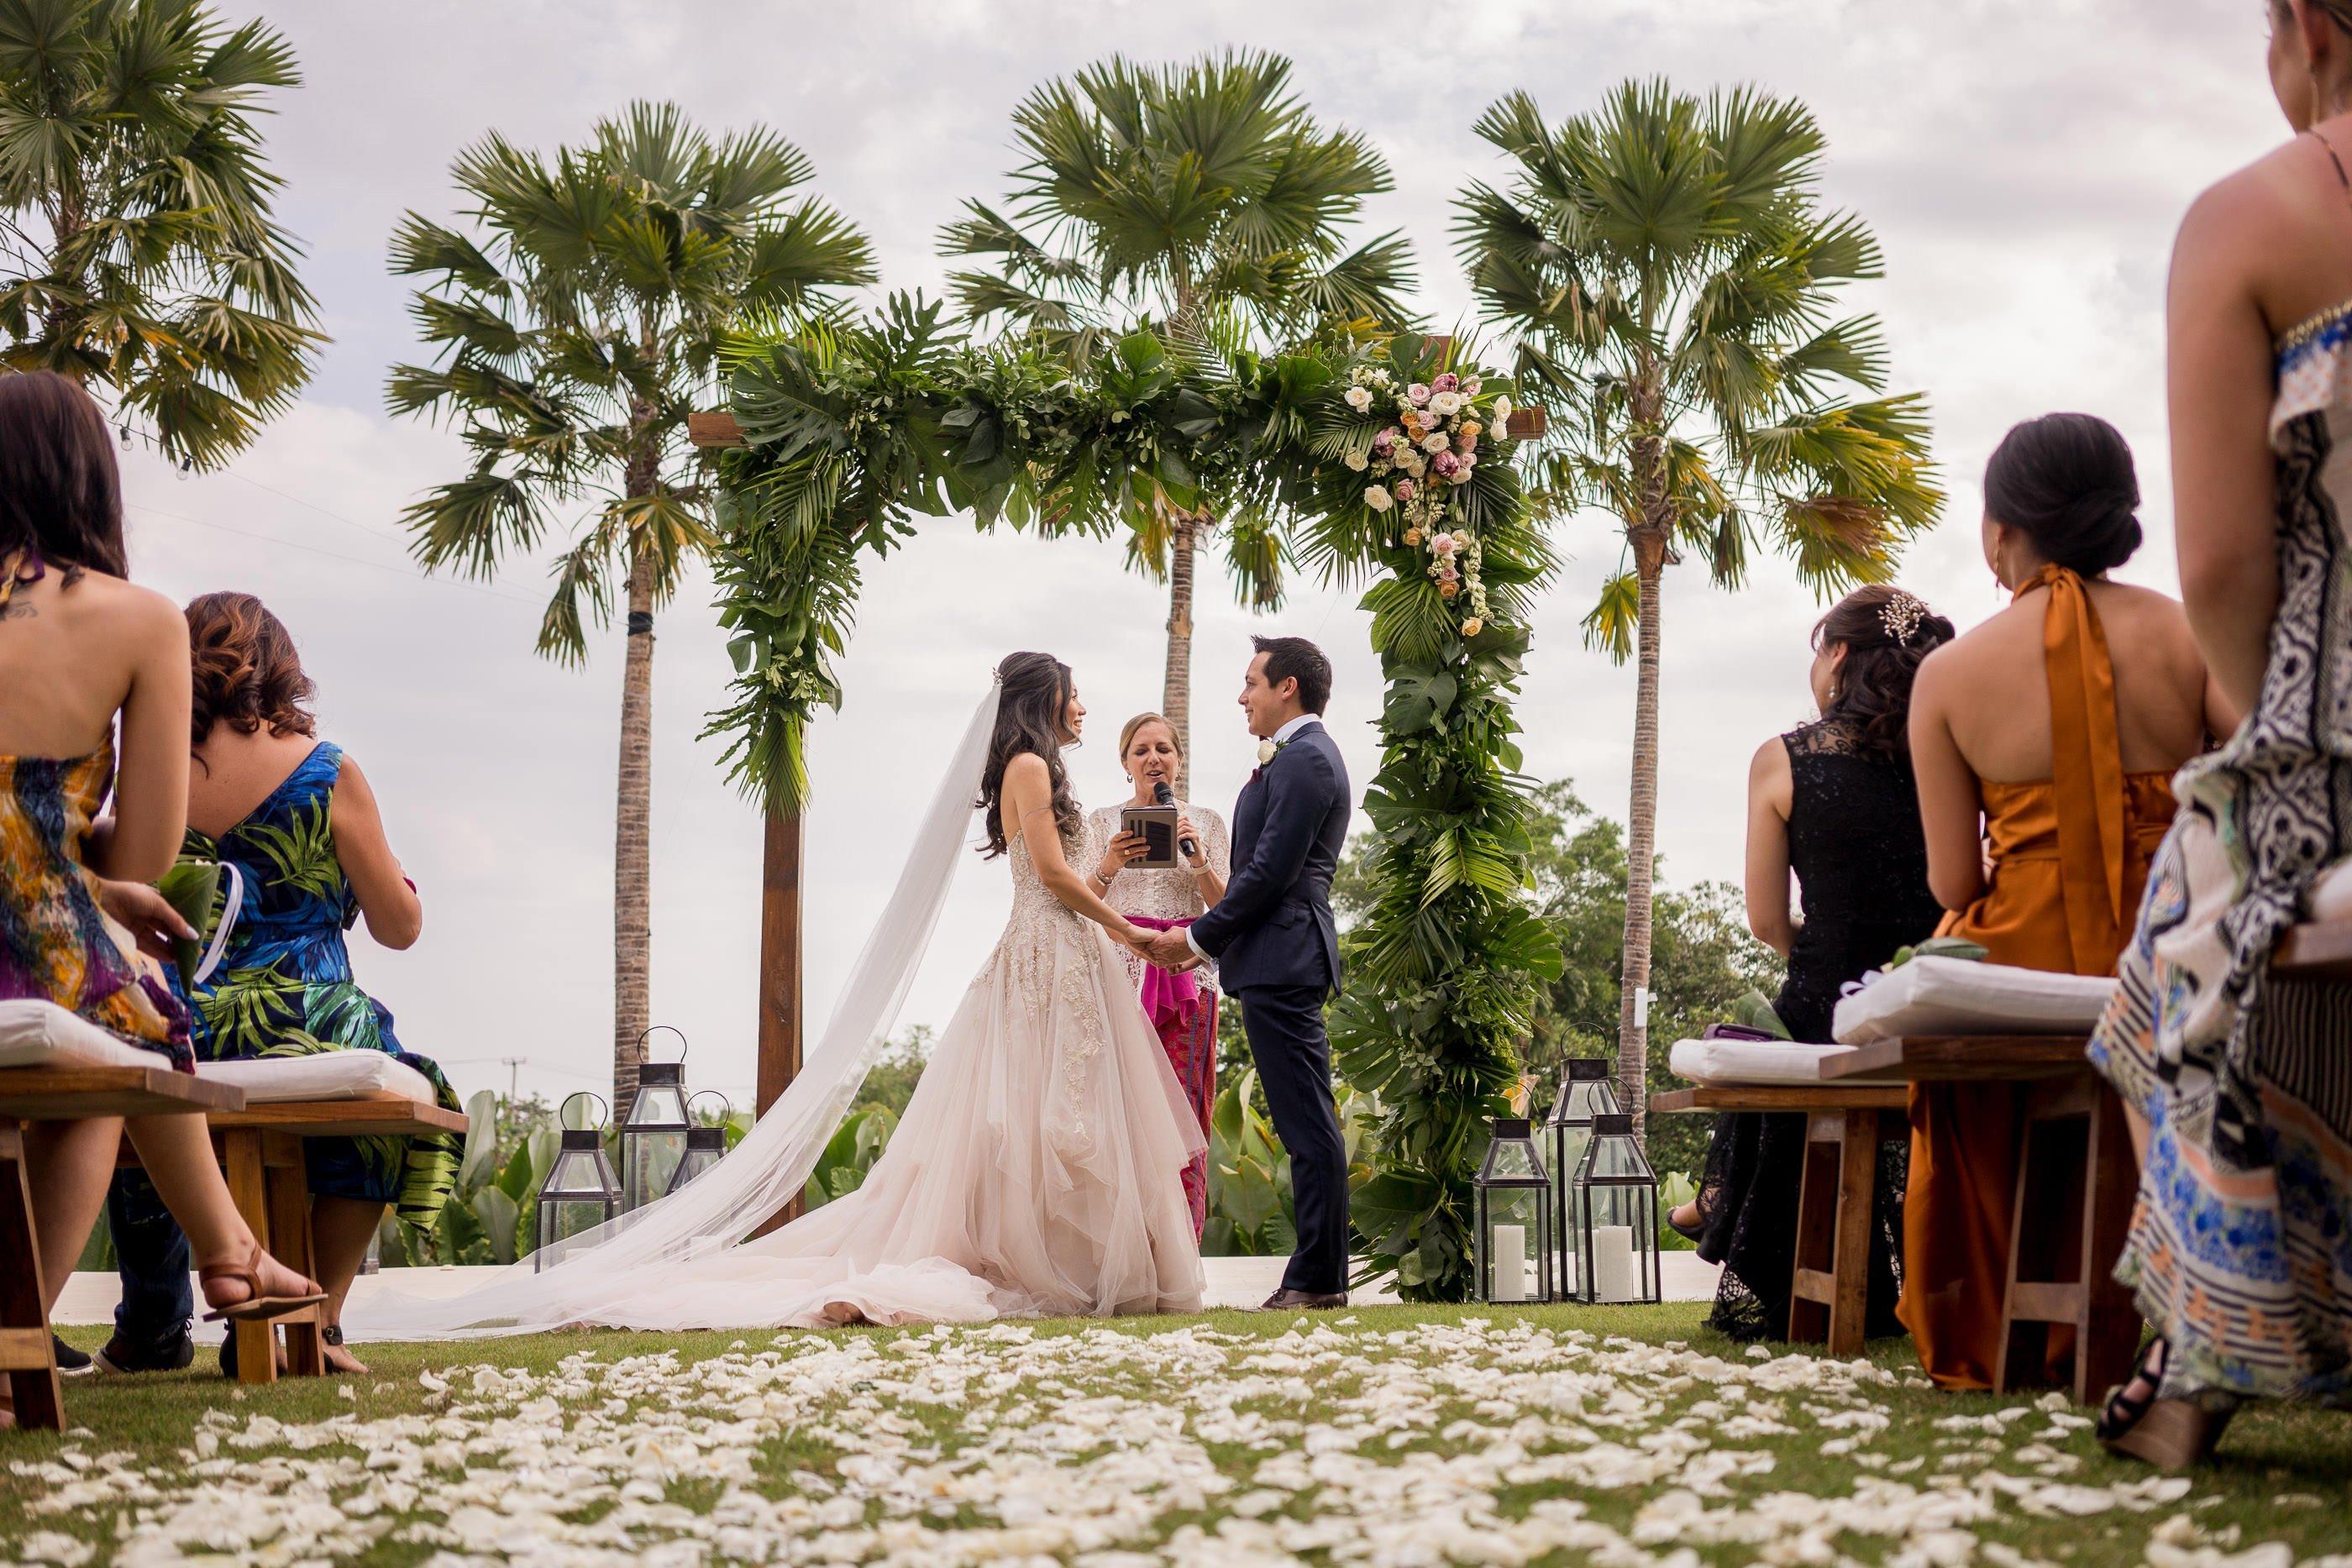 unique destination wedding ceremony ideas